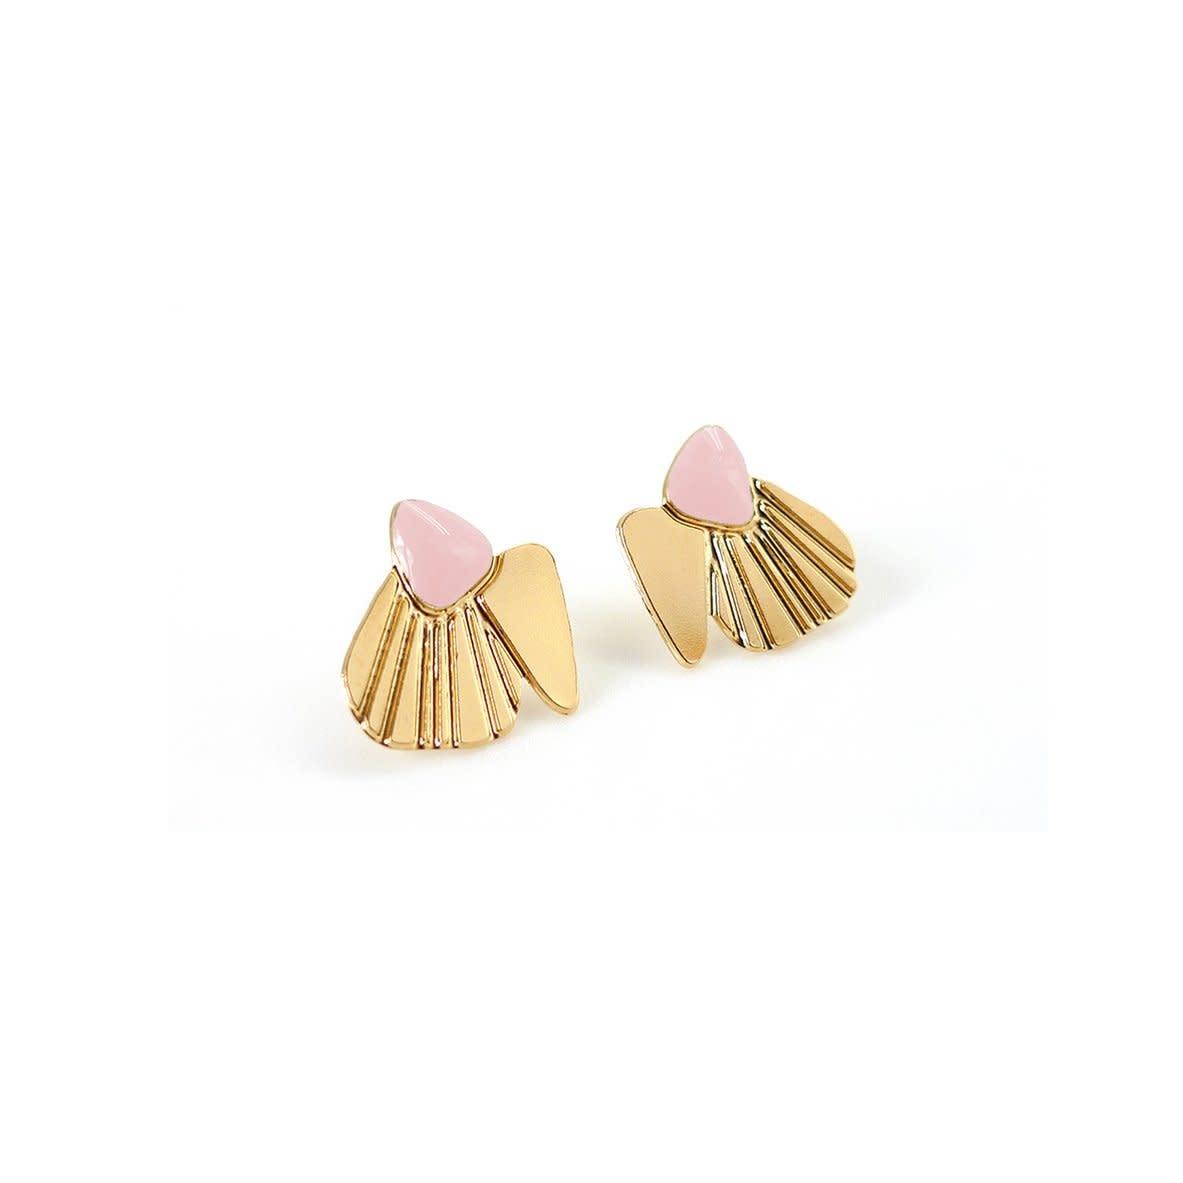 Nadja Carlotti Silver earrings Shell - Vieux rose